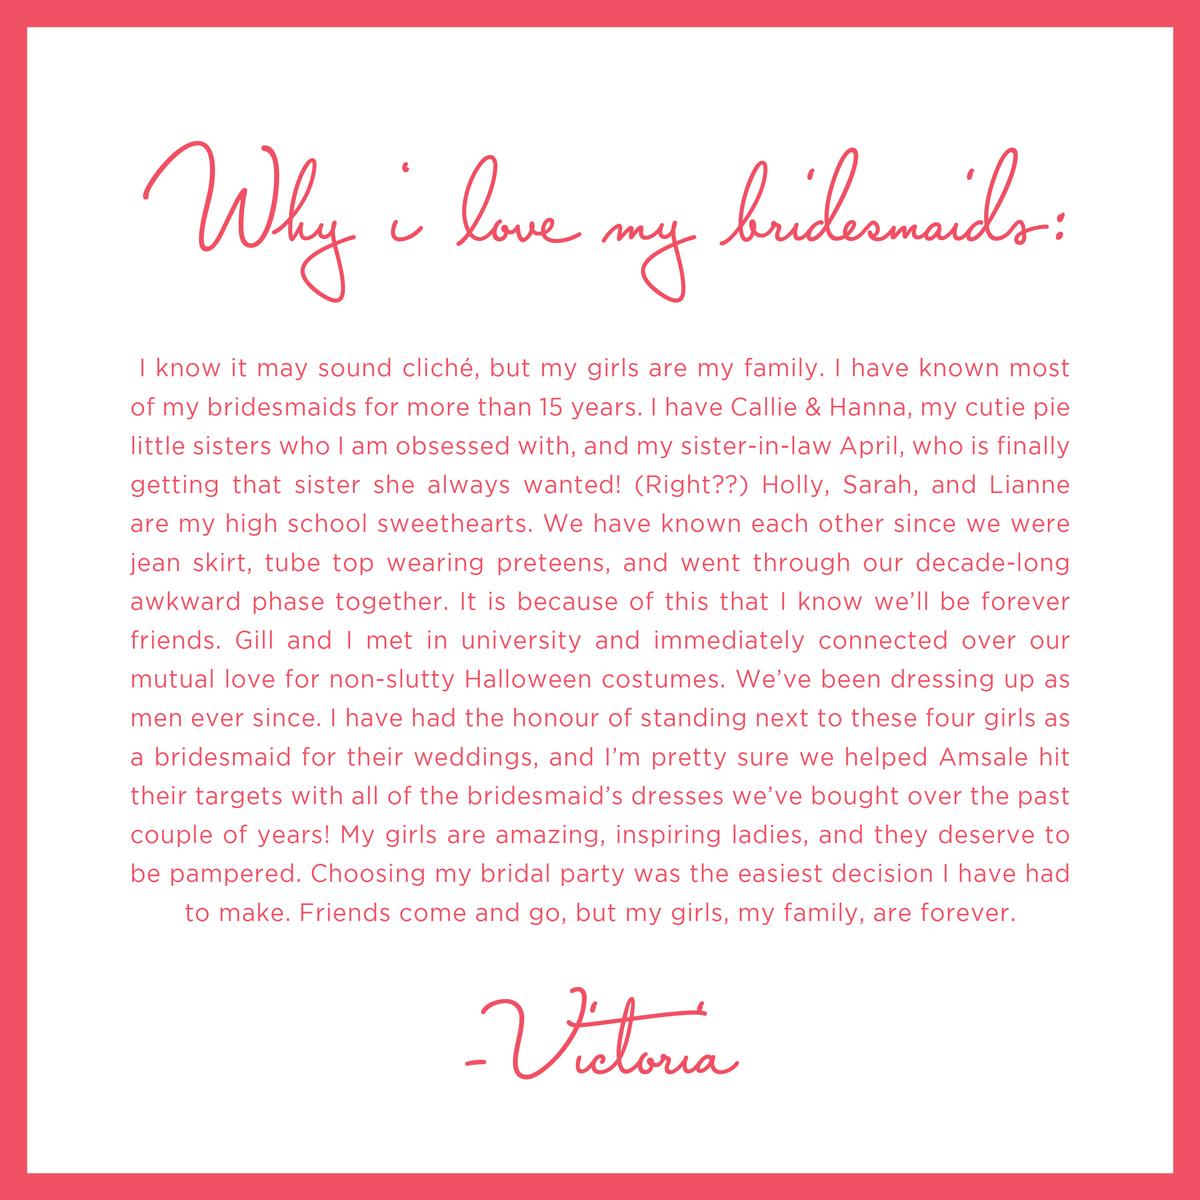 Pearl-Bridal-House-Love-Your-Girls-Victoria-2-Web.jpg